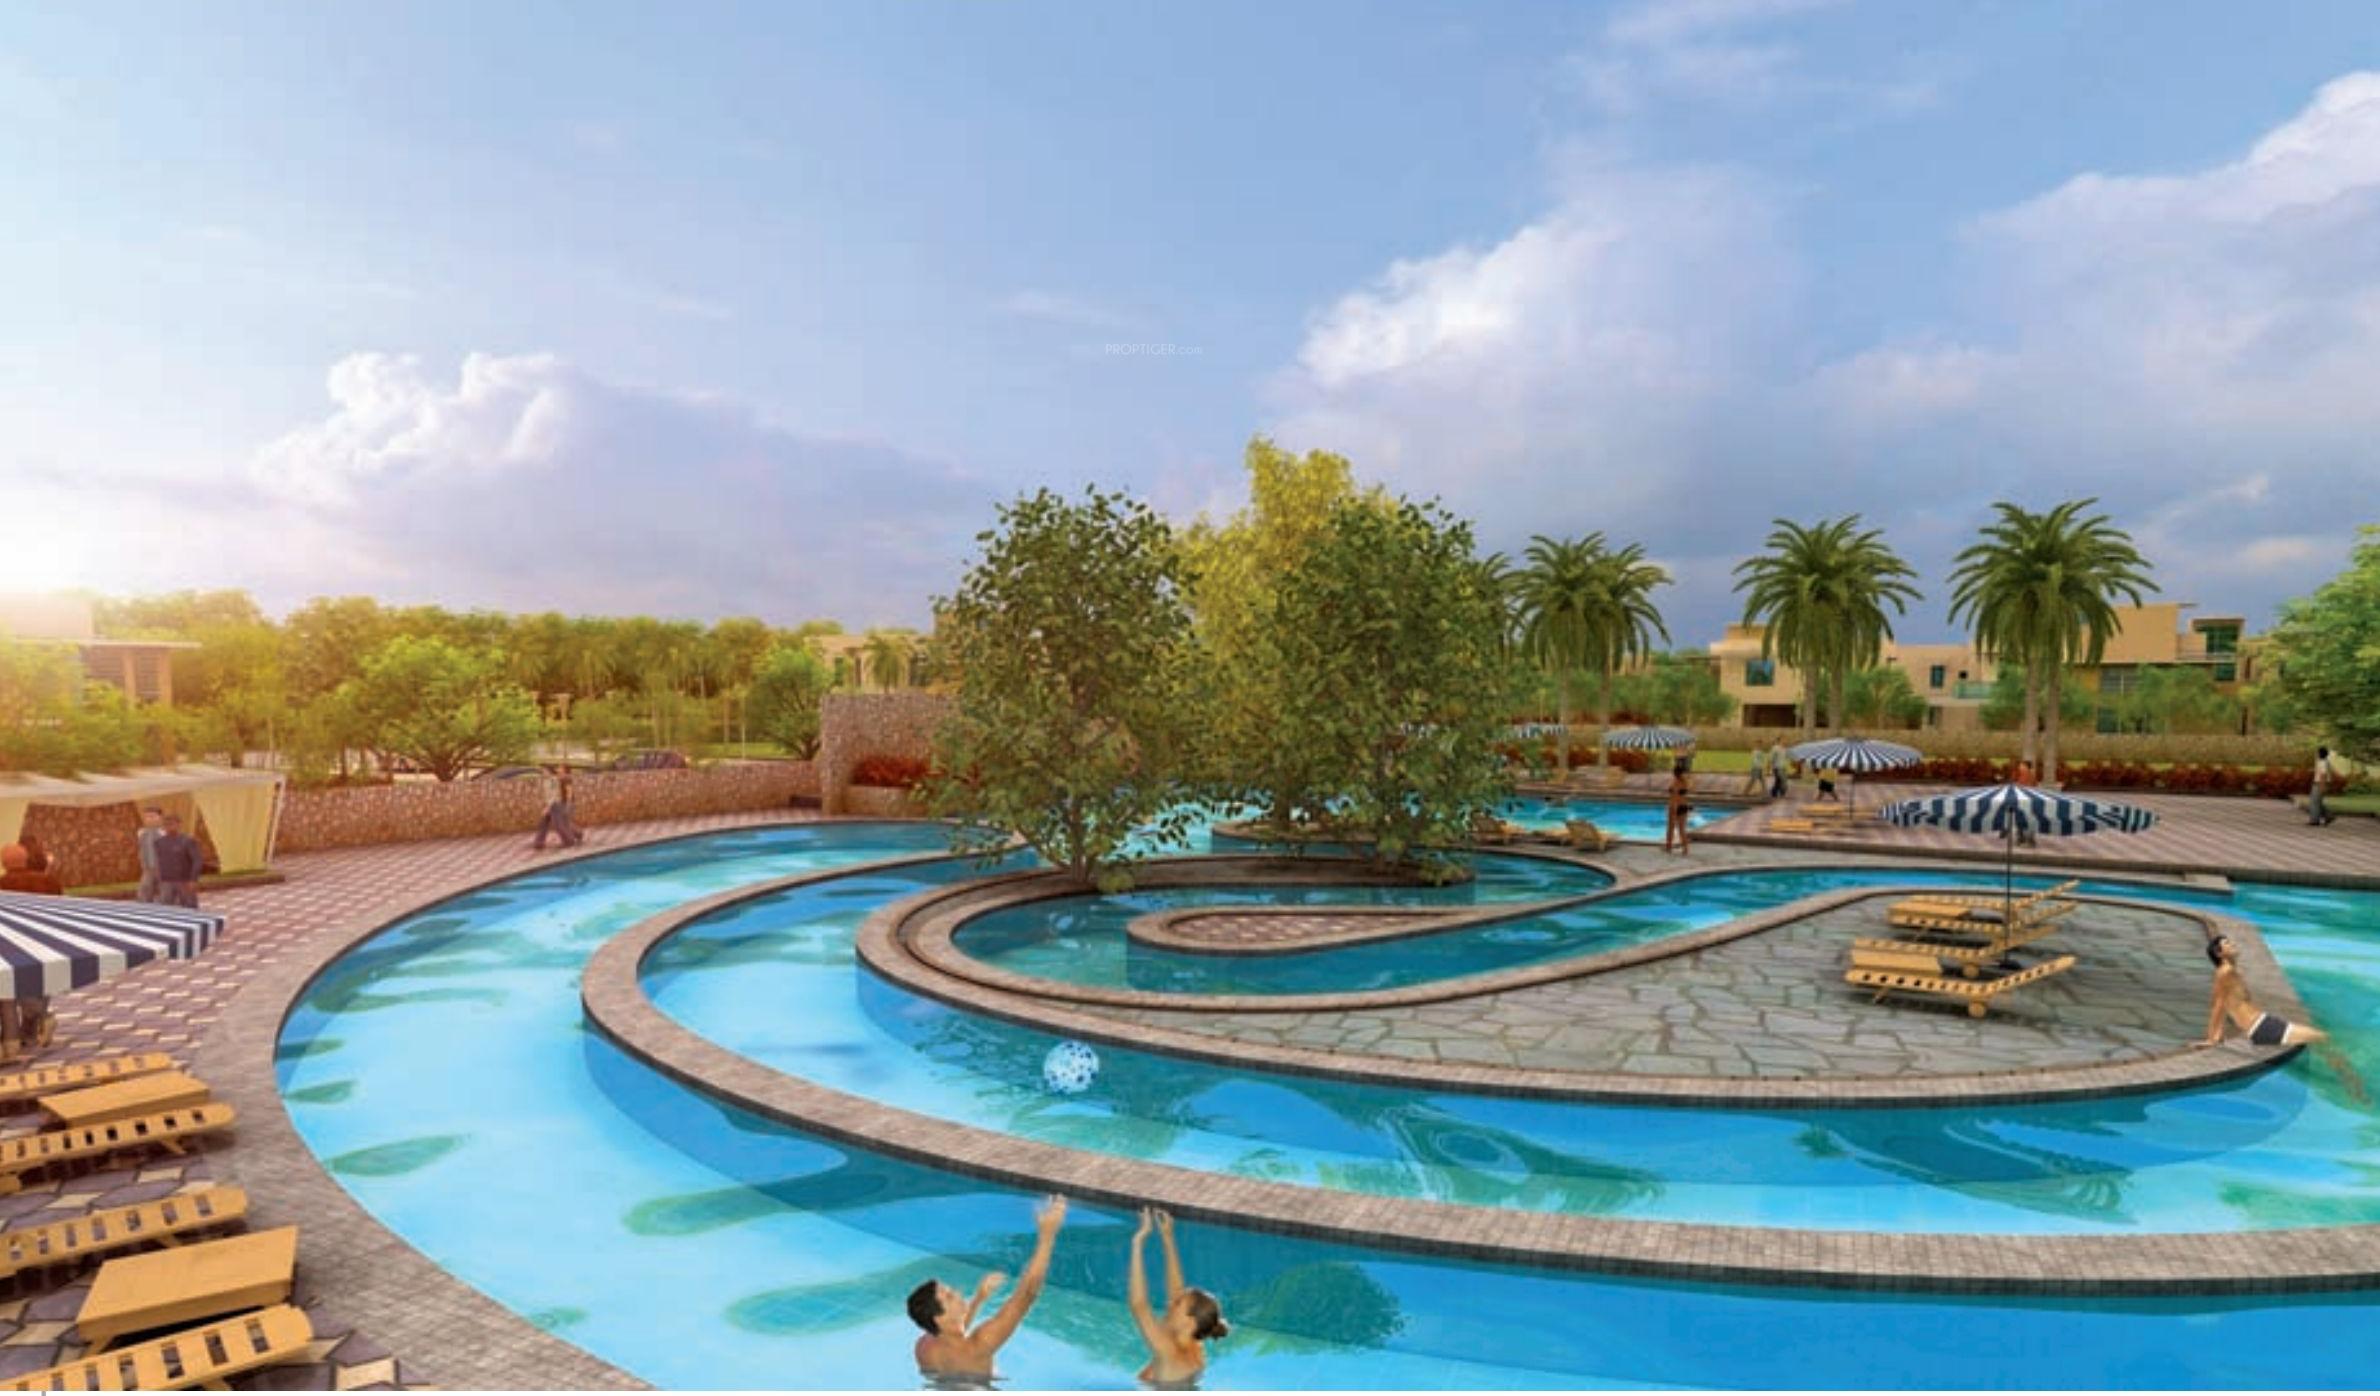 3850 Sq Ft 4 Bhk 5t Villa For Sale In Mahindra Lifespaces Developers Aqualily Villa Singaperumal